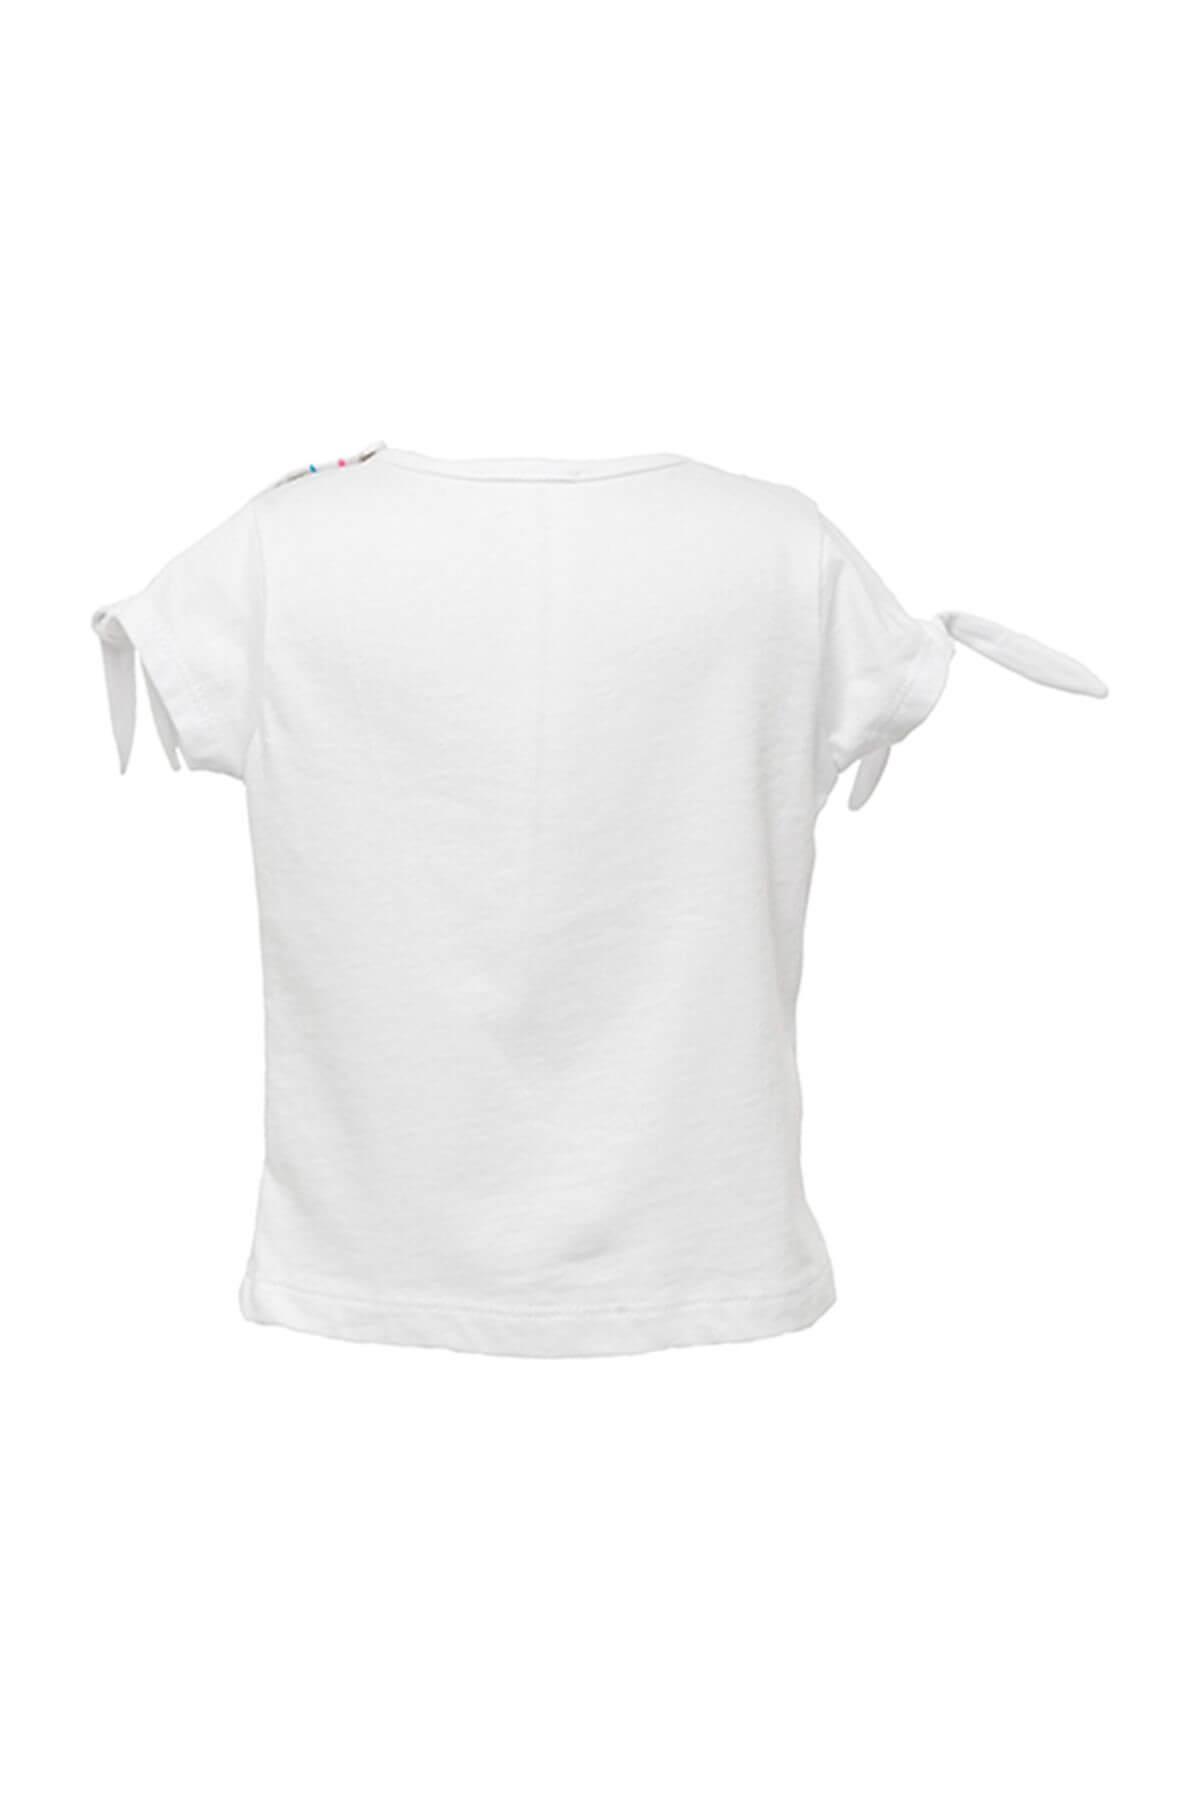 Zeyland Beyaz Kız Bebek T-Shirt 81Z2HNT54 2